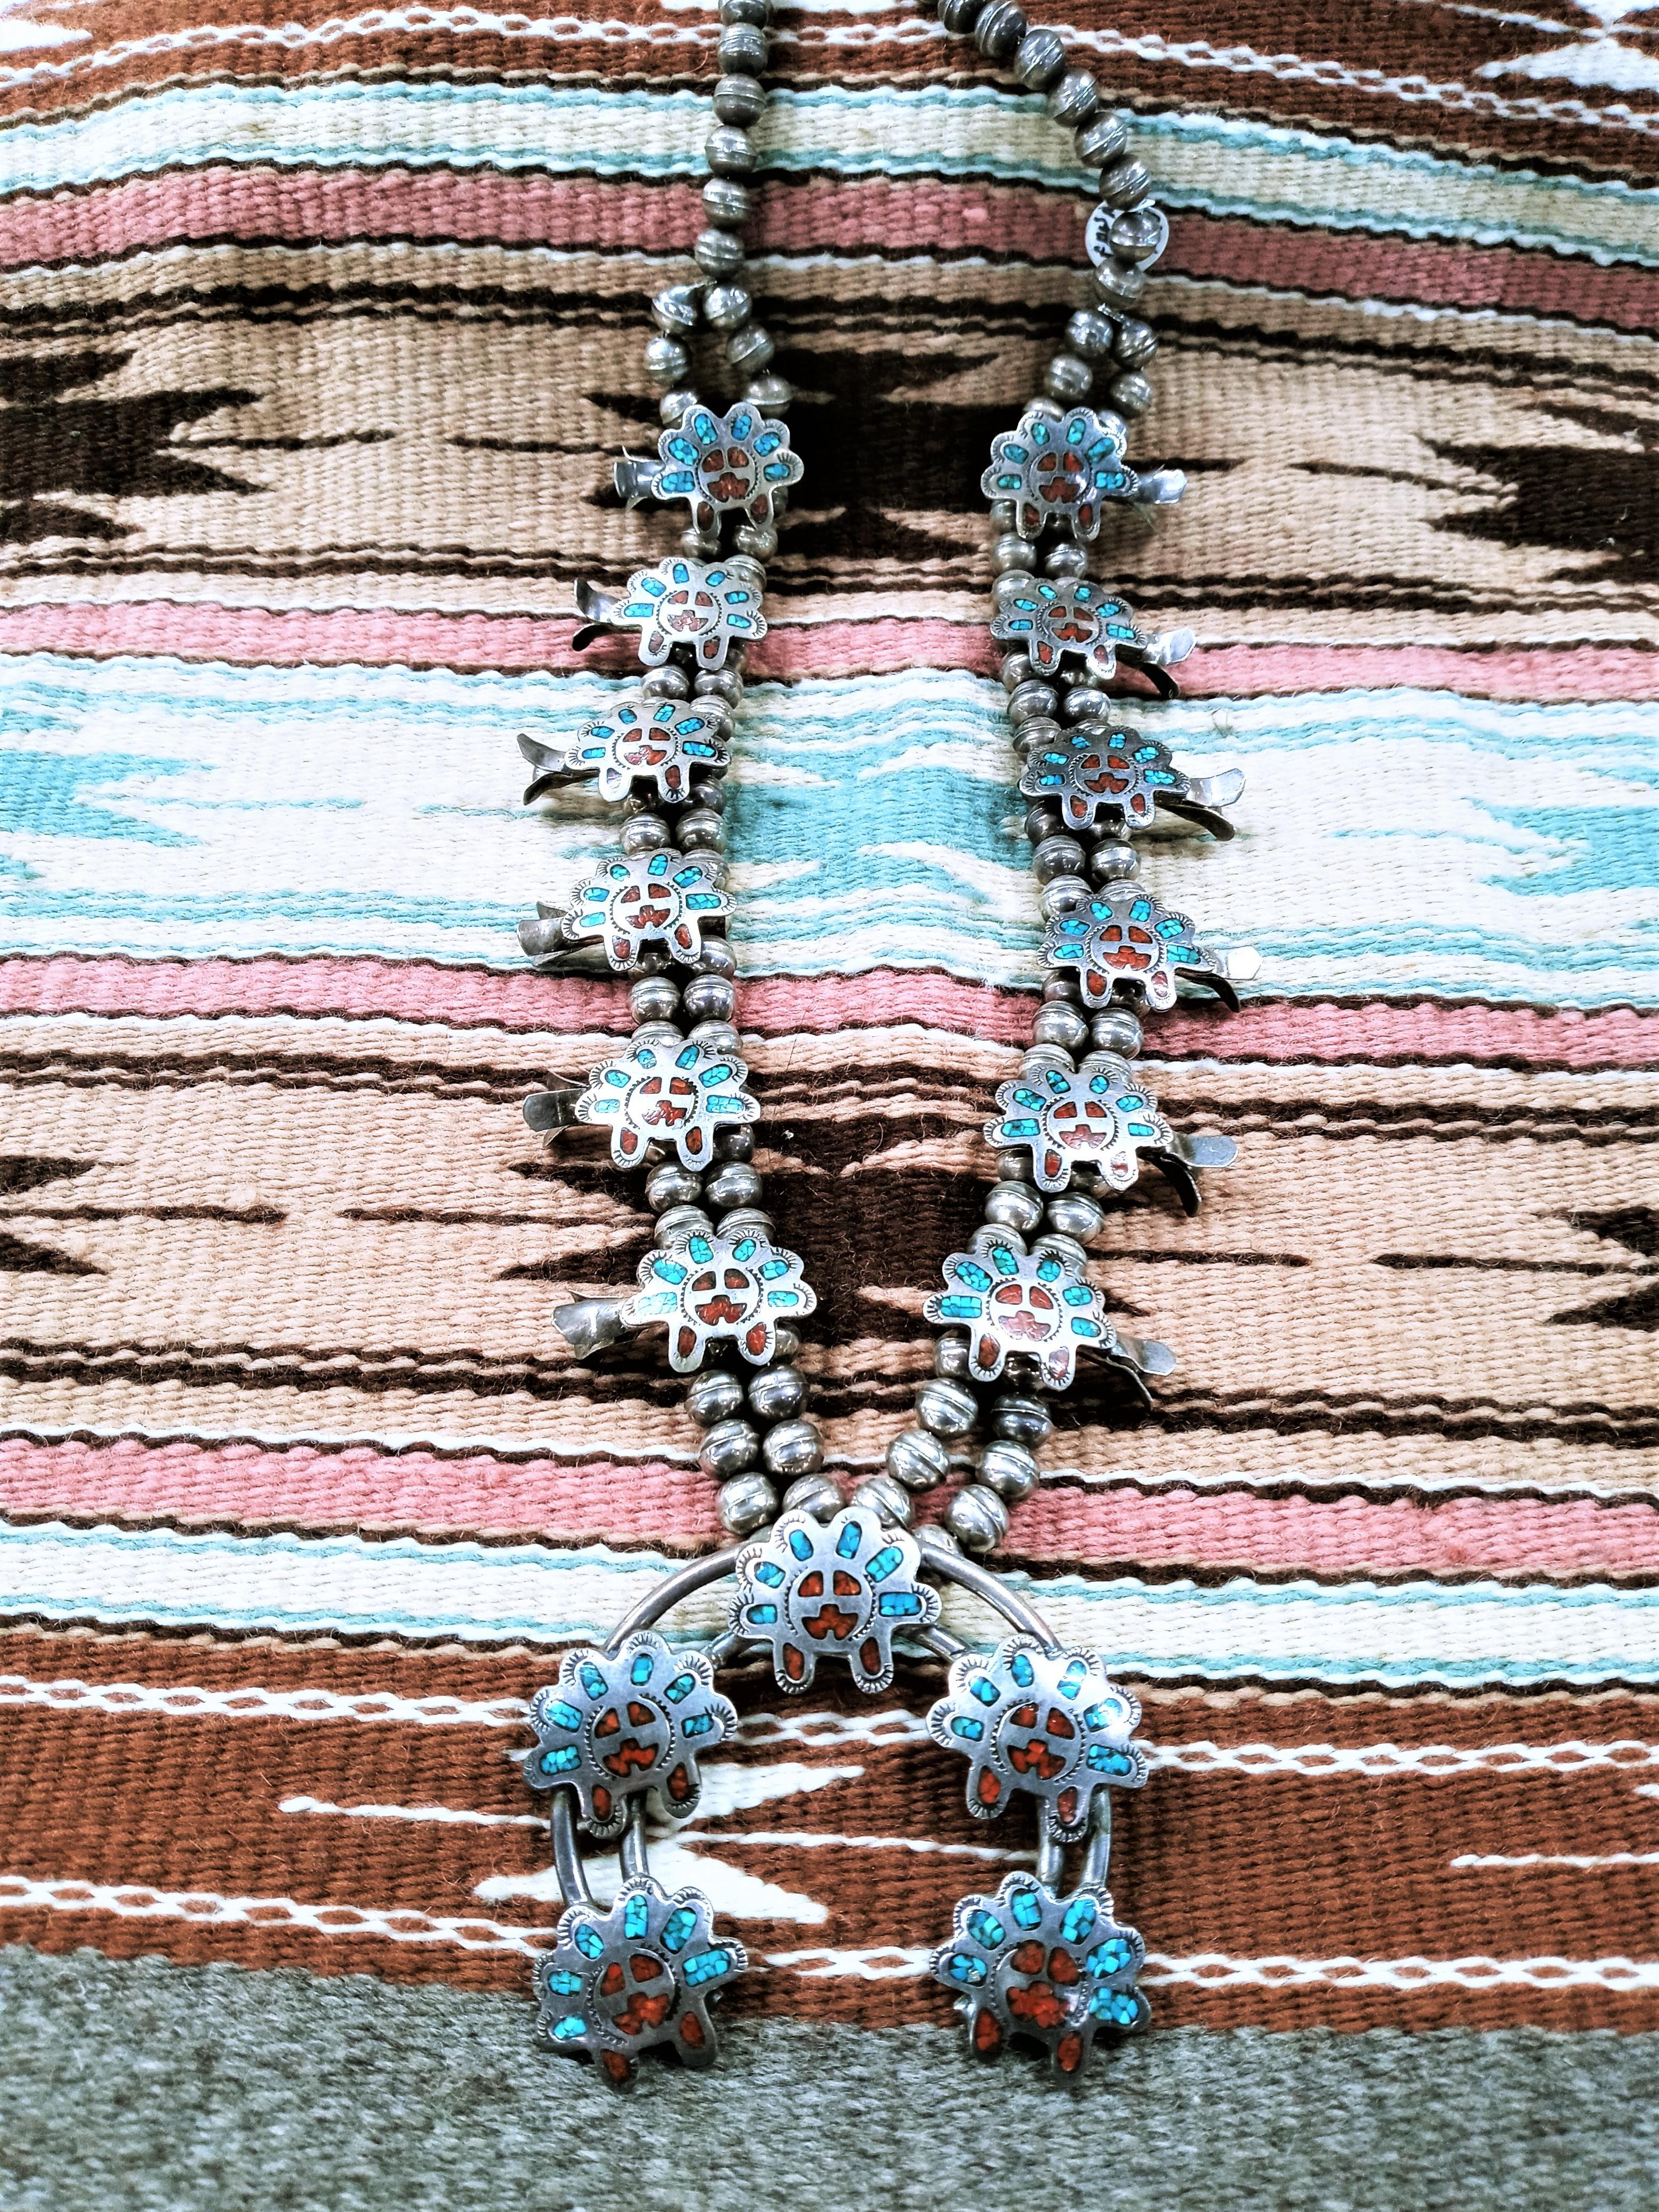 SBN1- Pawn Squash Blossom Necklace